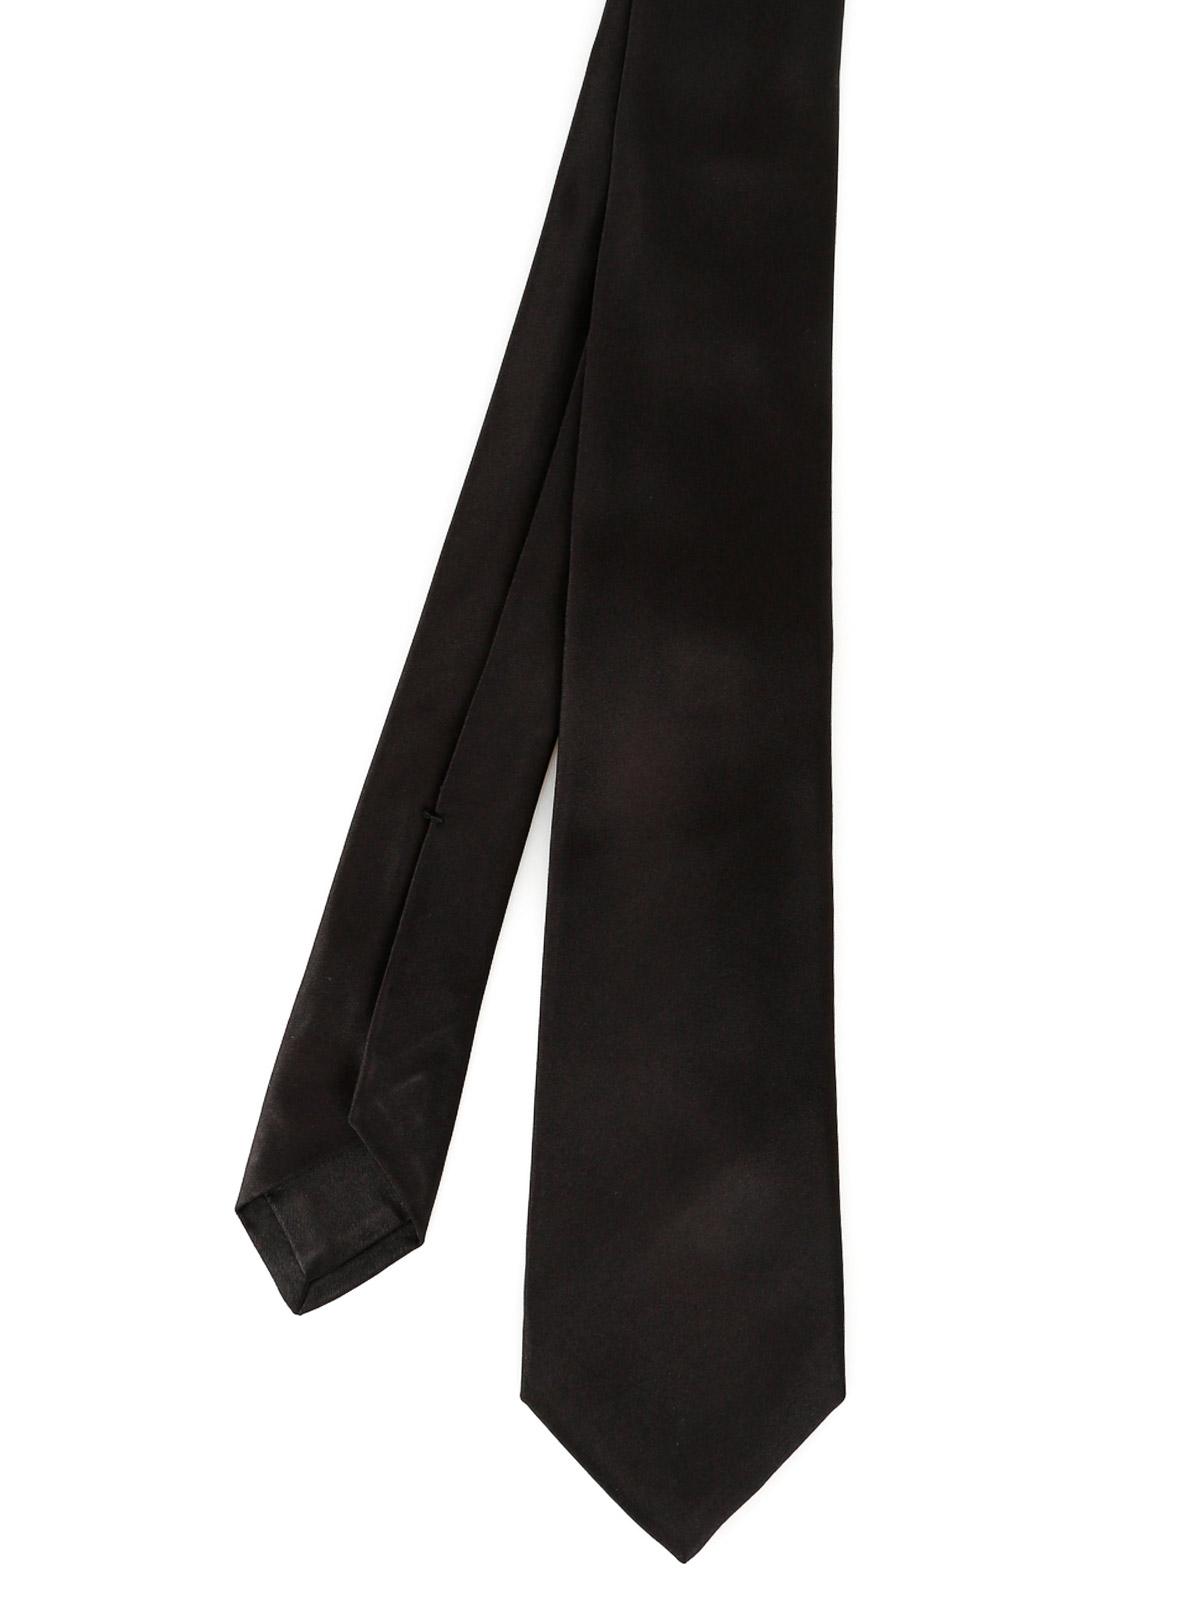 Picture of KITON | Men's Black Tie